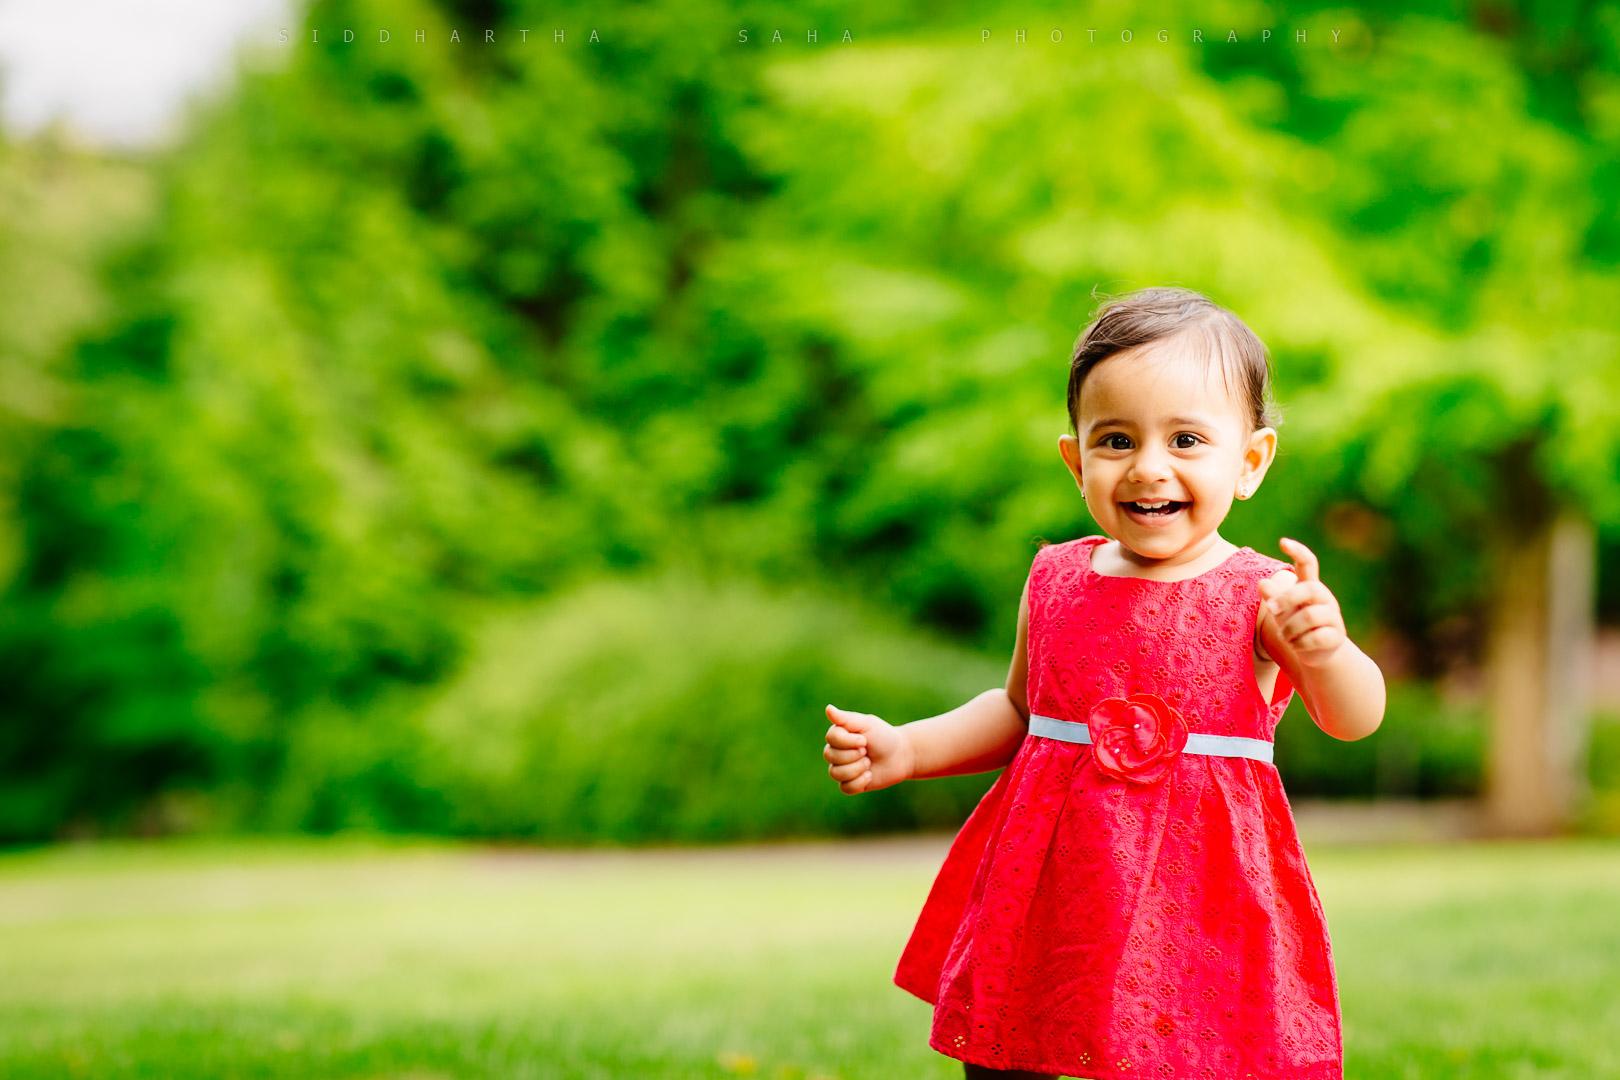 2015-08-08 - Padmaja Ketan Family Photoshoot - _05Y8940